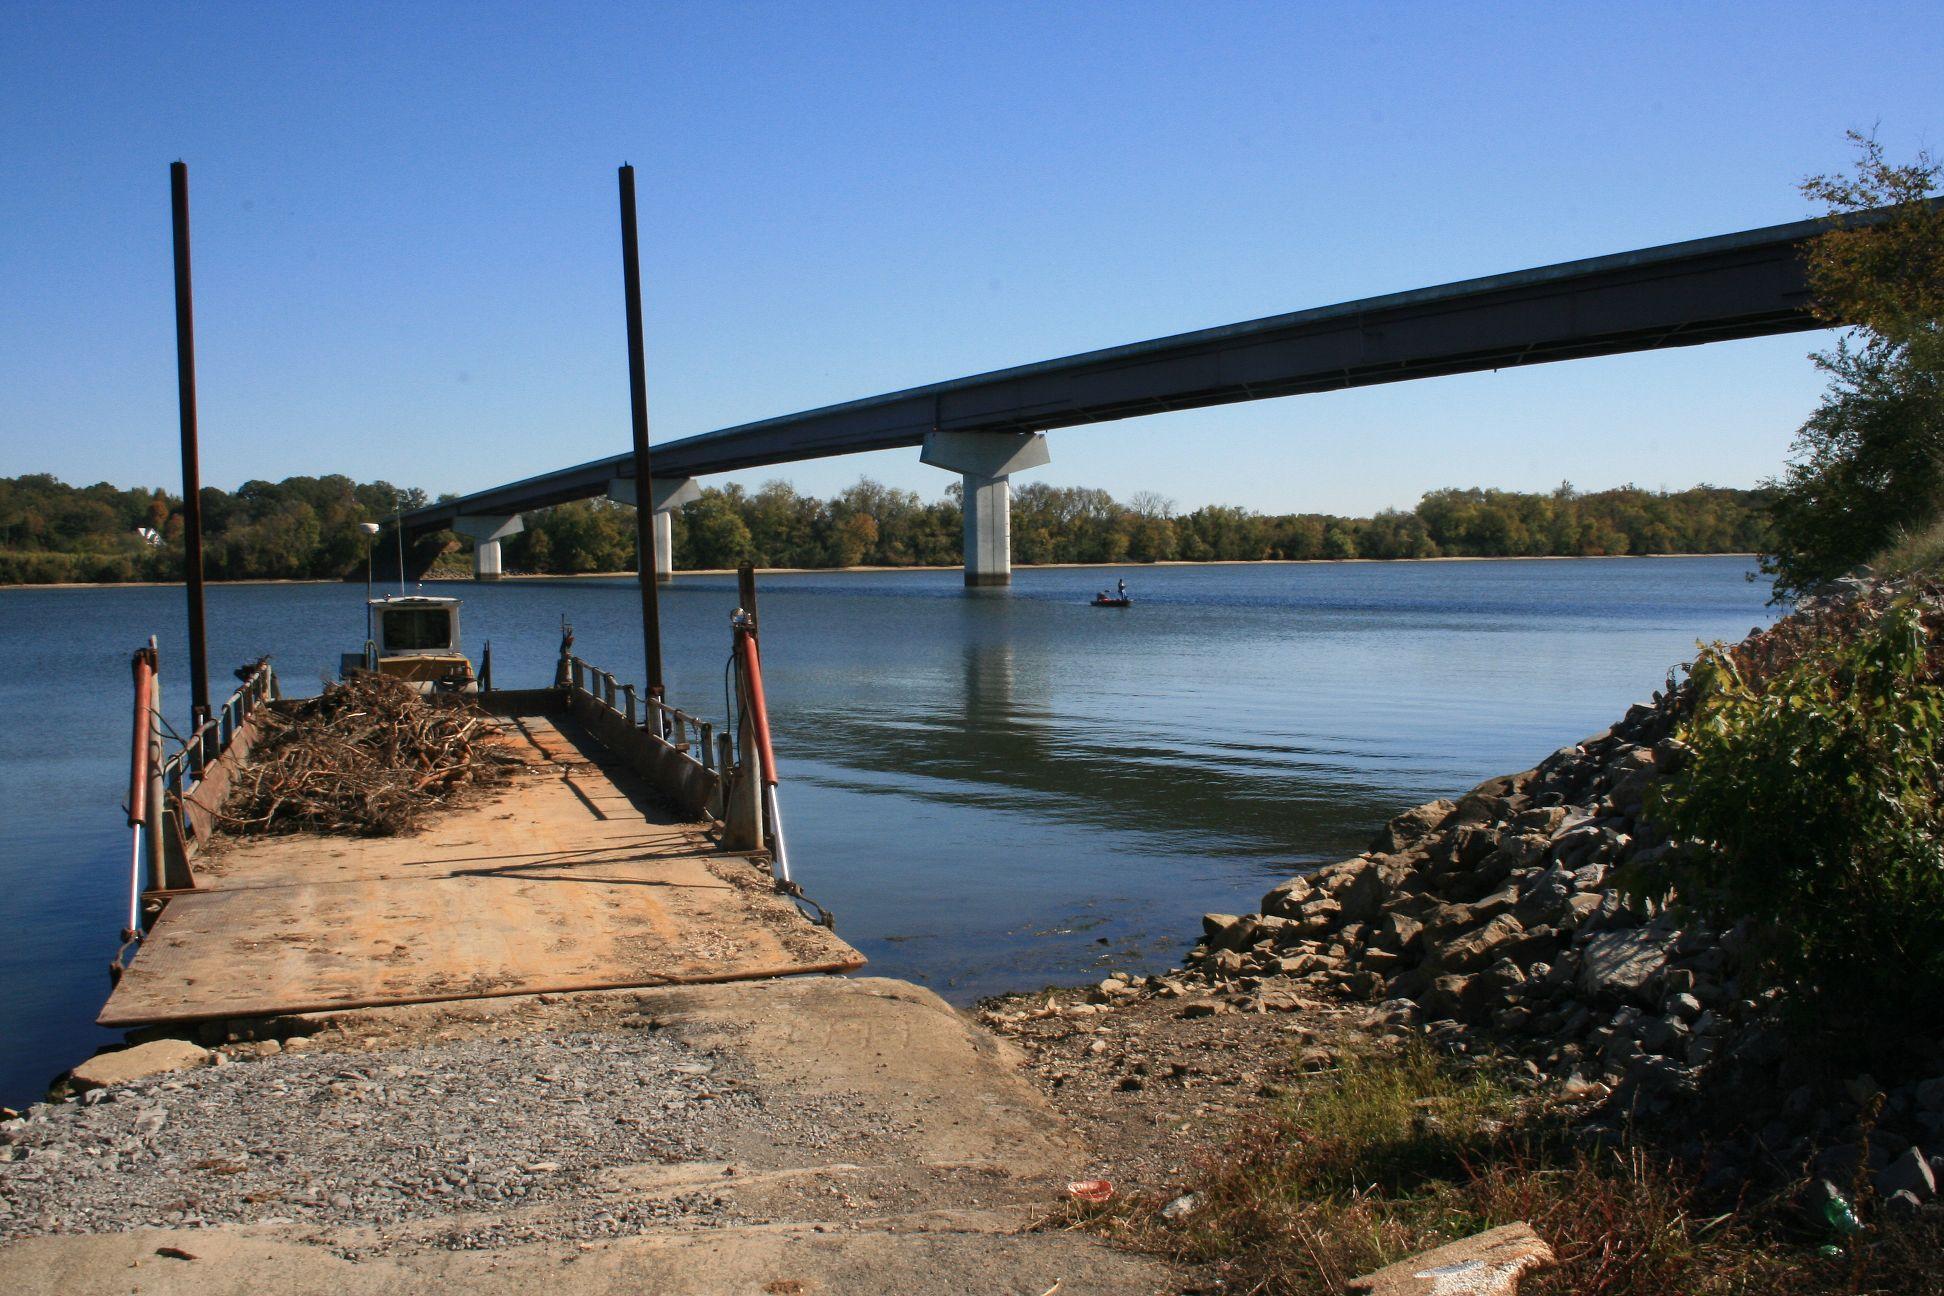 New Bridge across Tennessee River